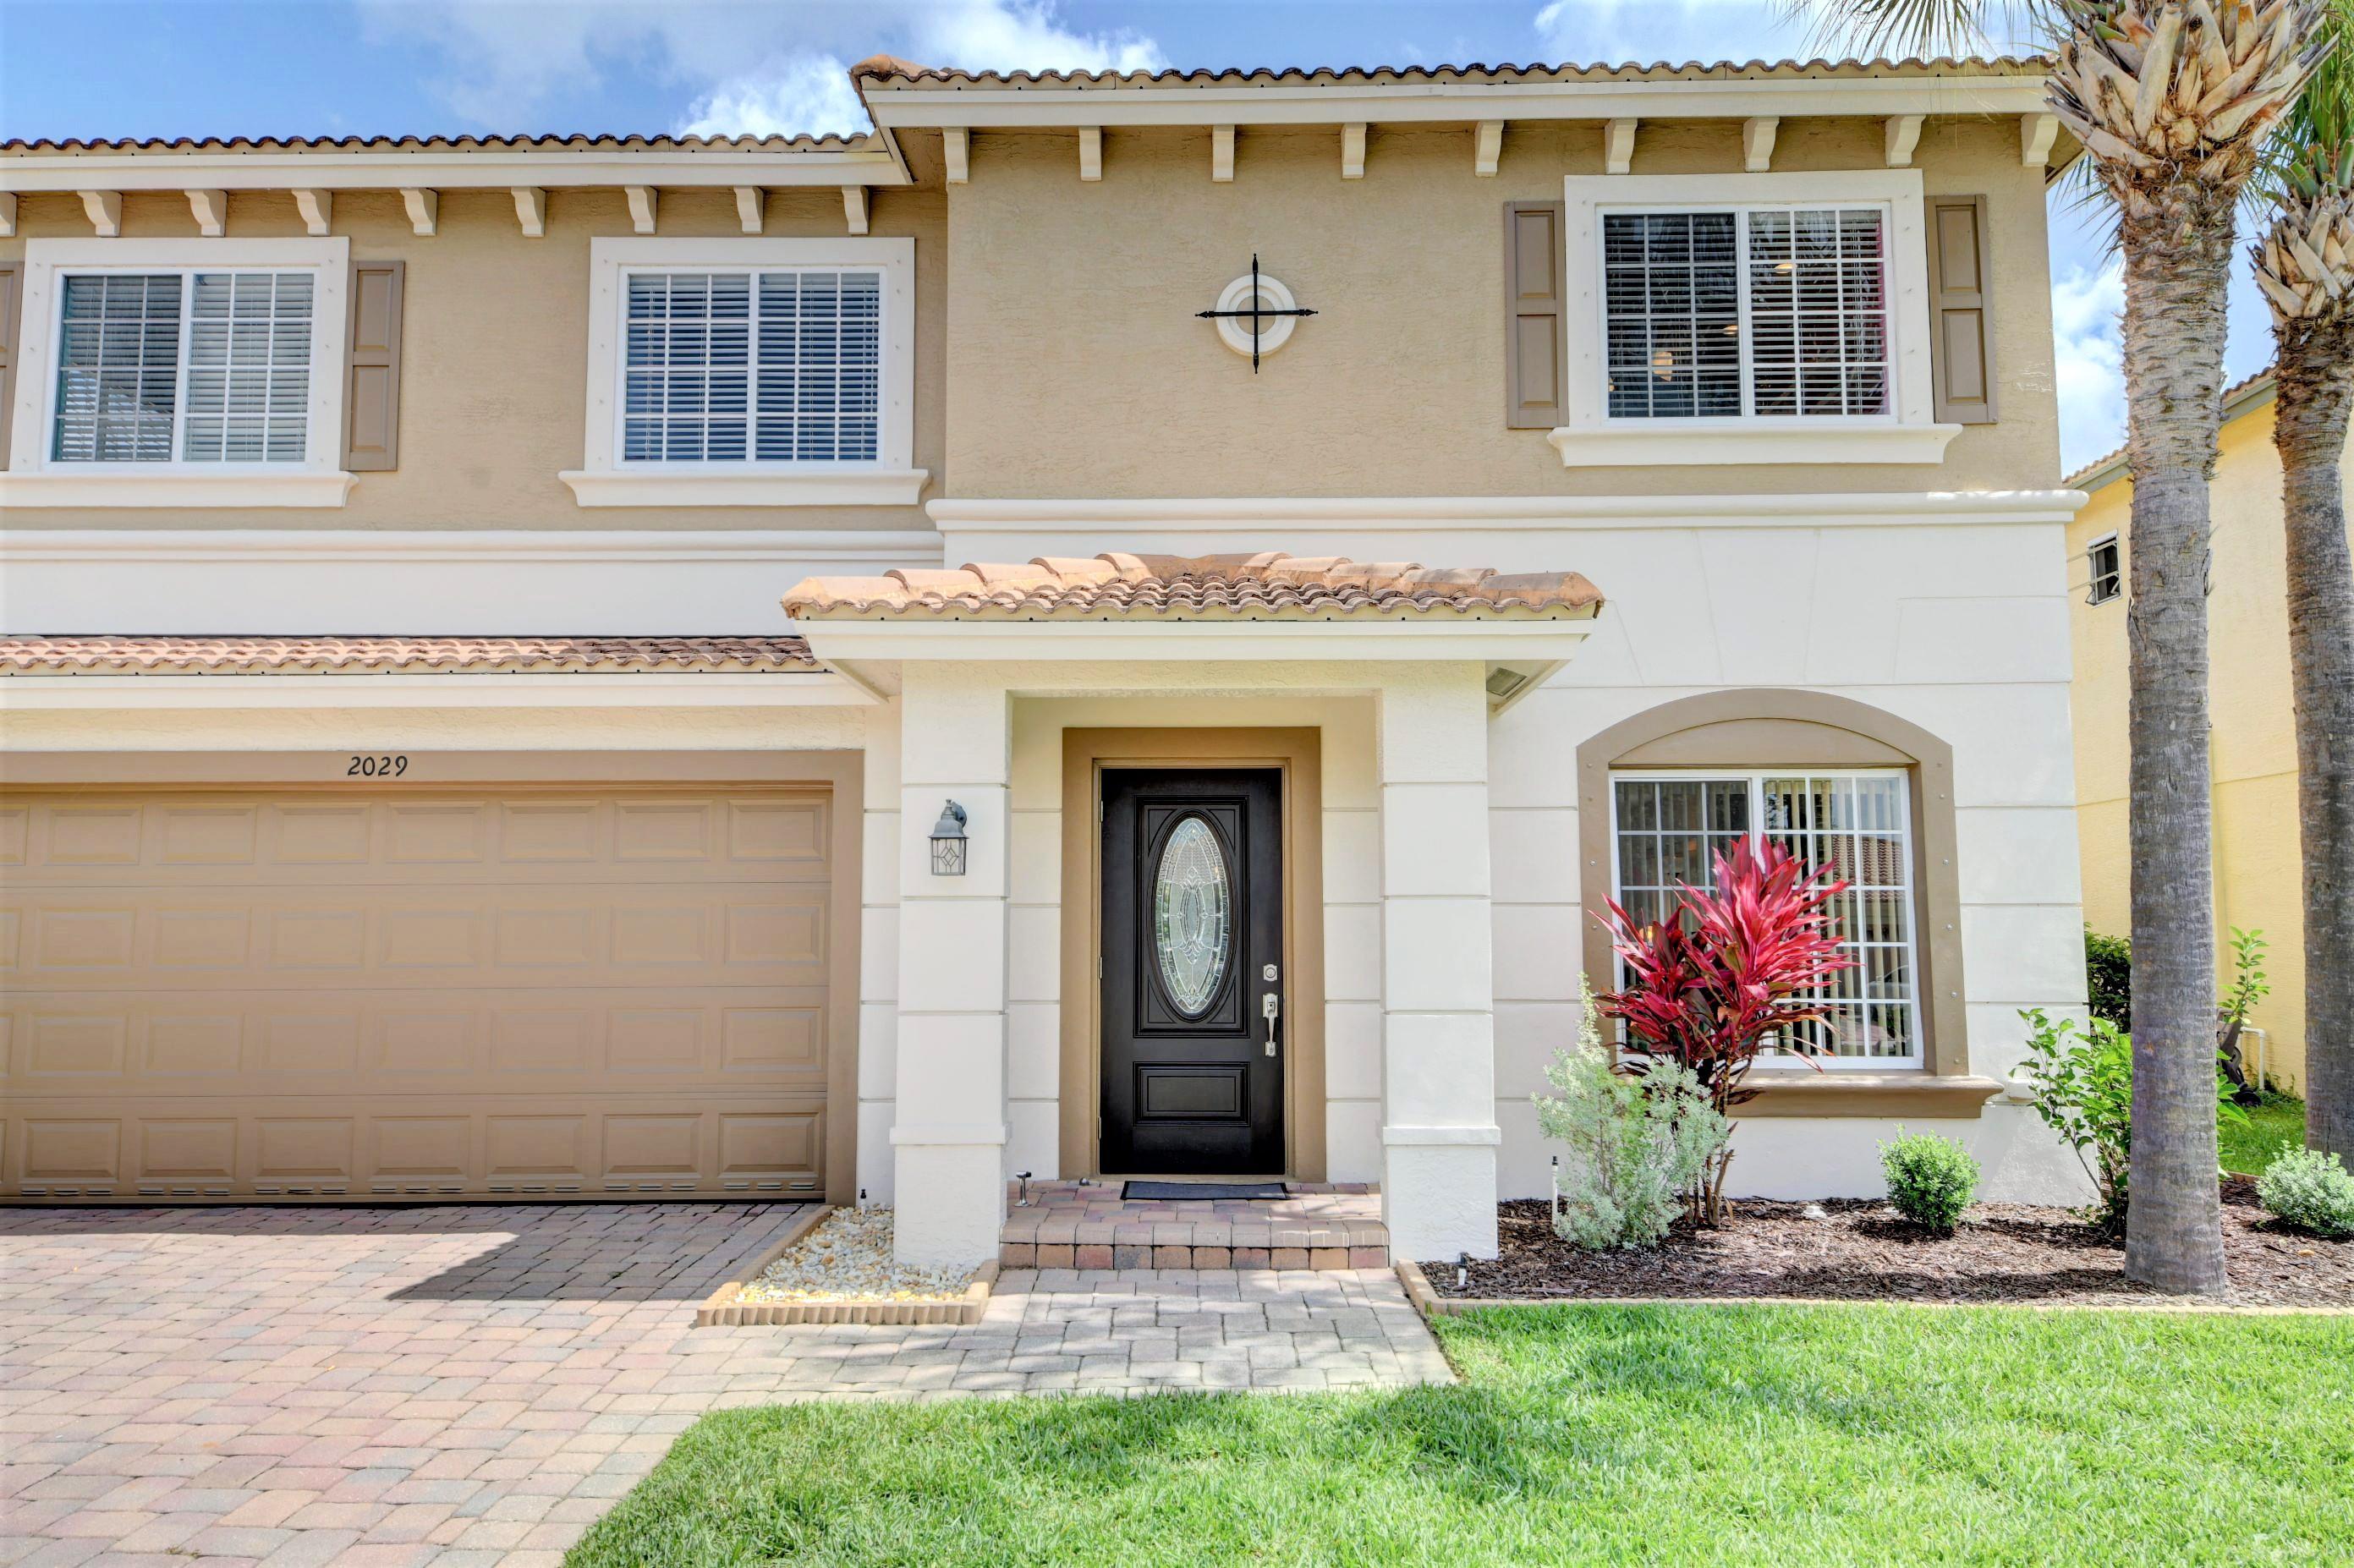 2029 Sw Providence Place, Port Saint Lucie, FL 34953